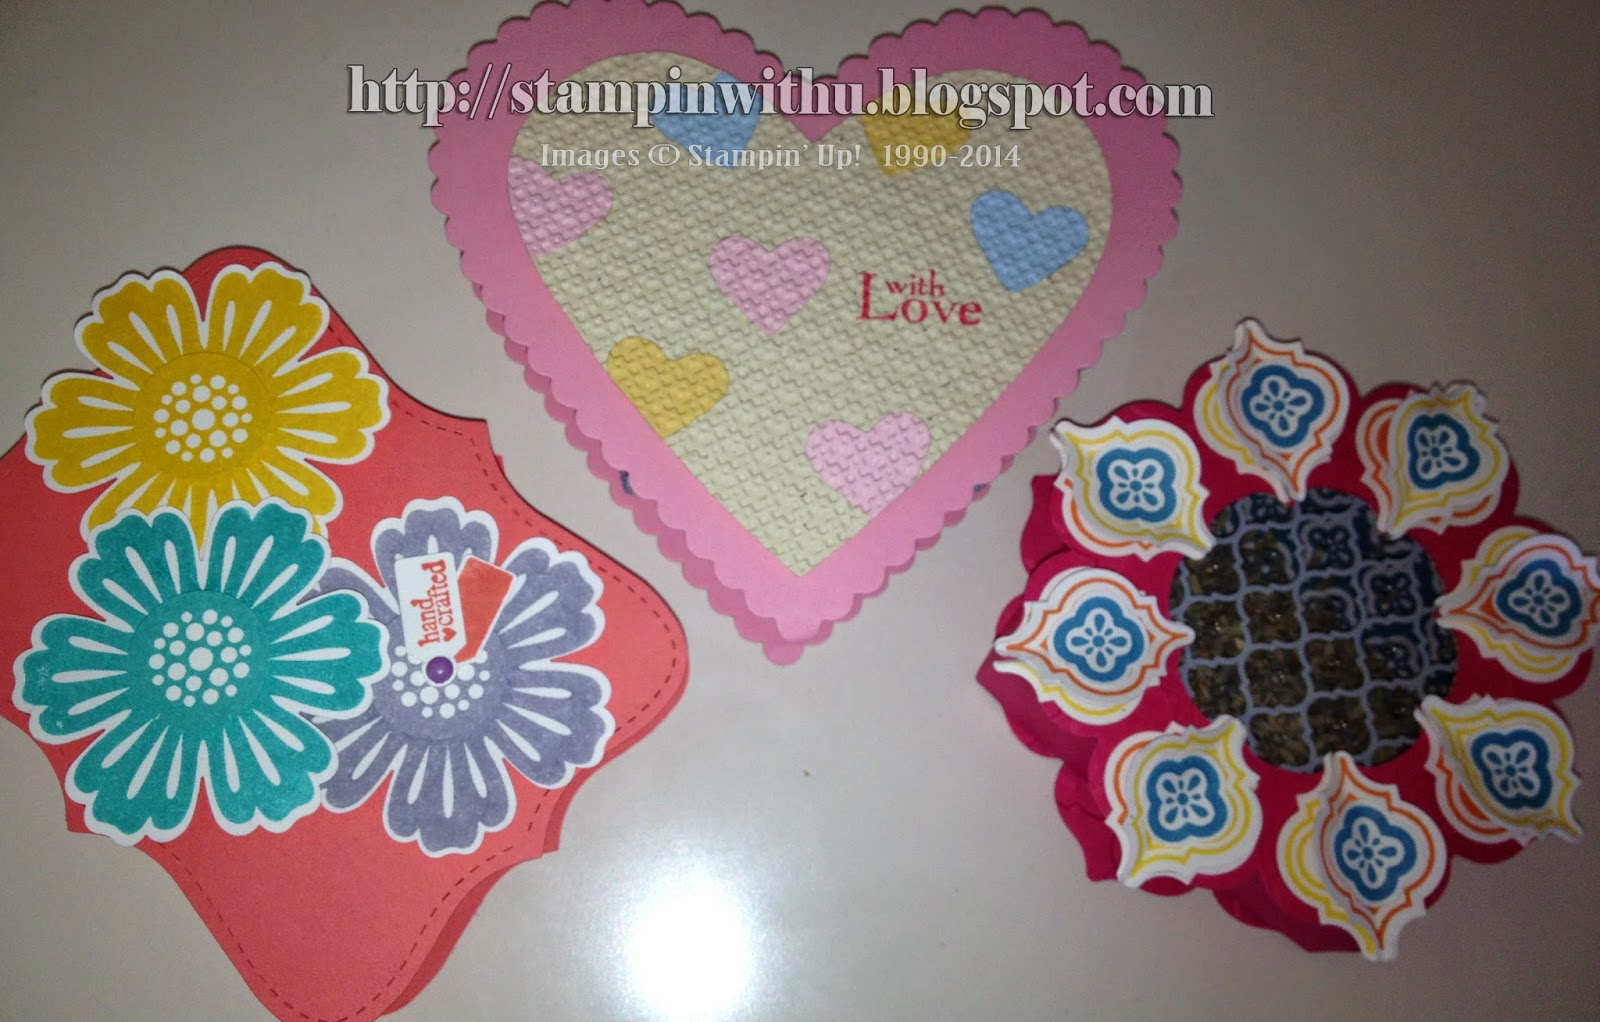 Box comp 3 more entries